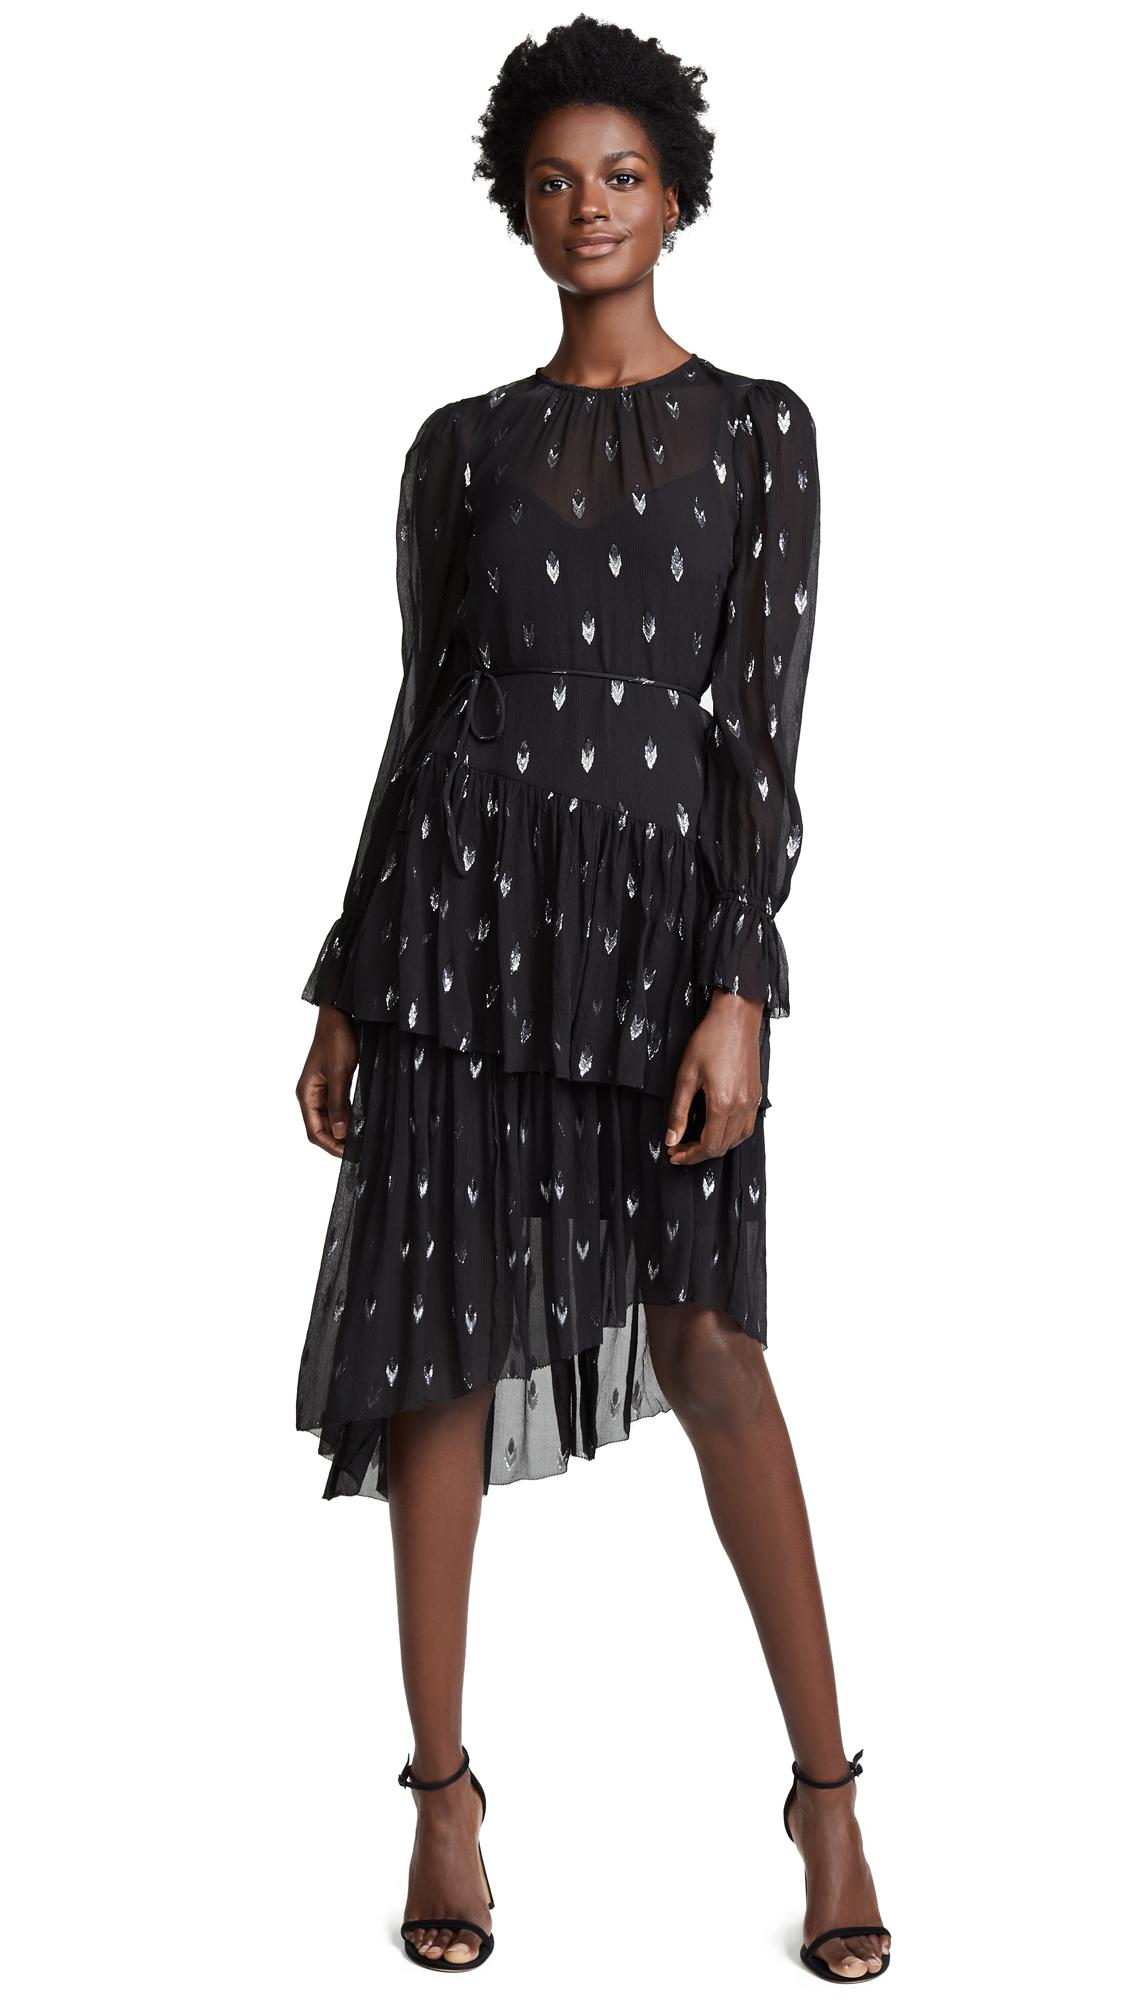 Joie Maylene Dress In Caviar